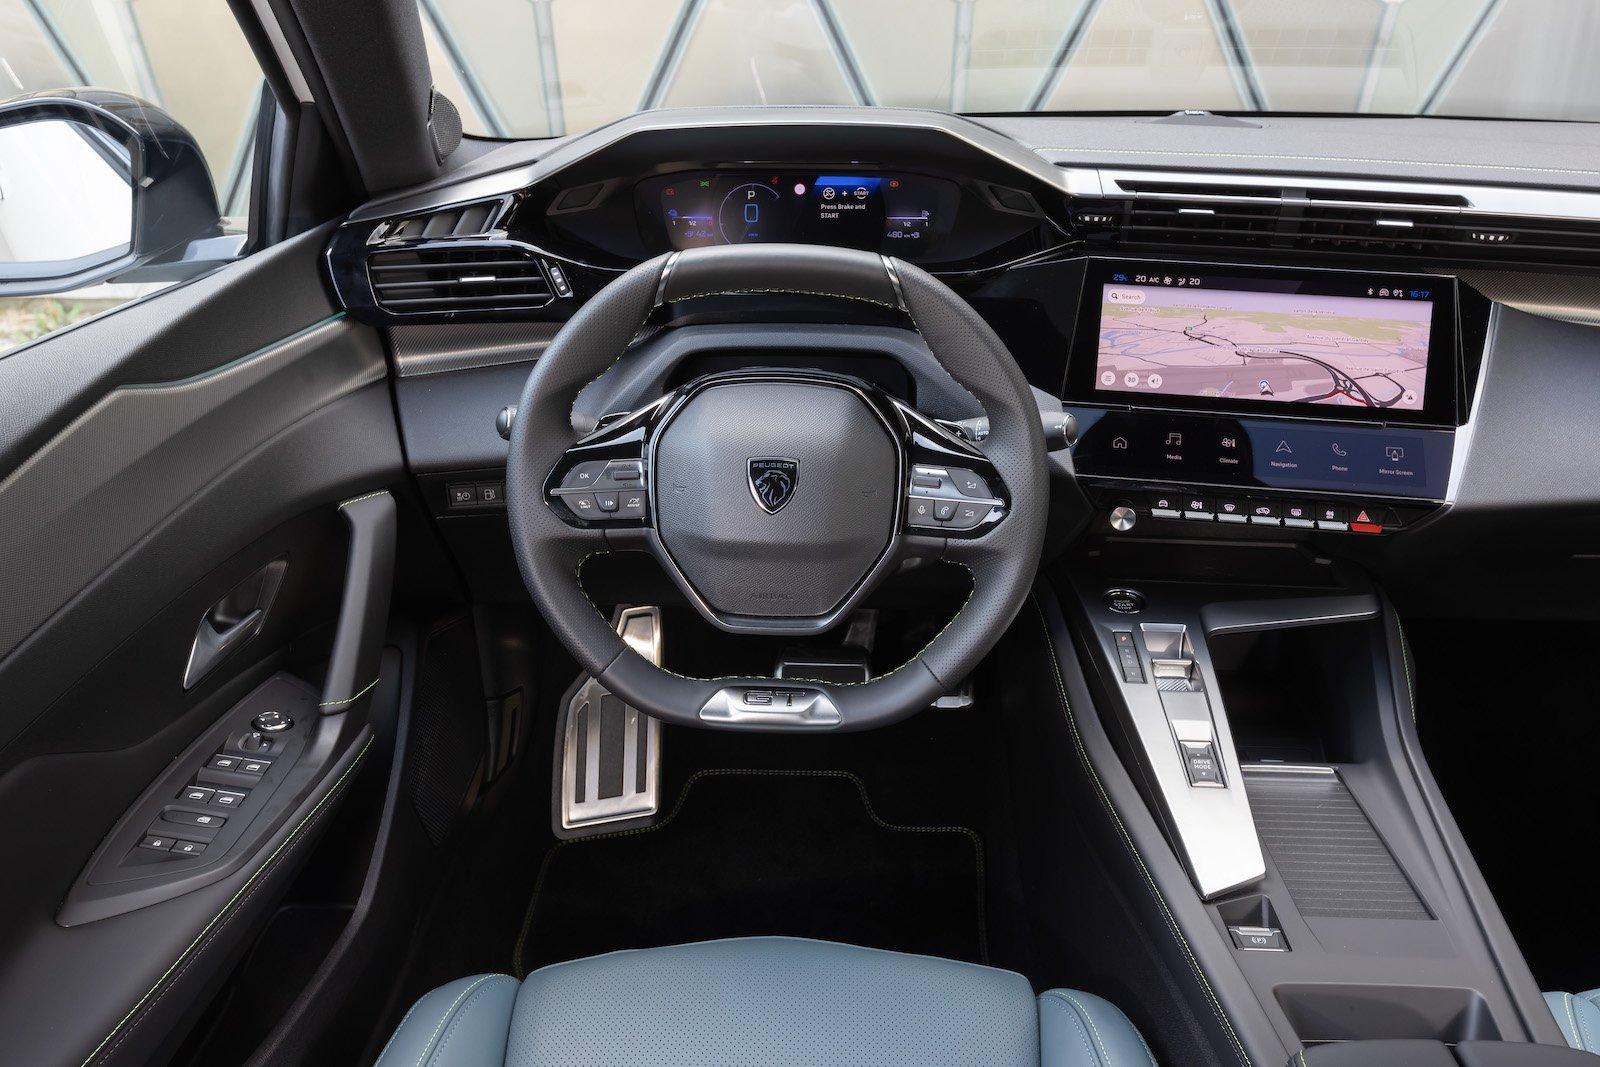 Peugeot 308 2021 interior dashboard